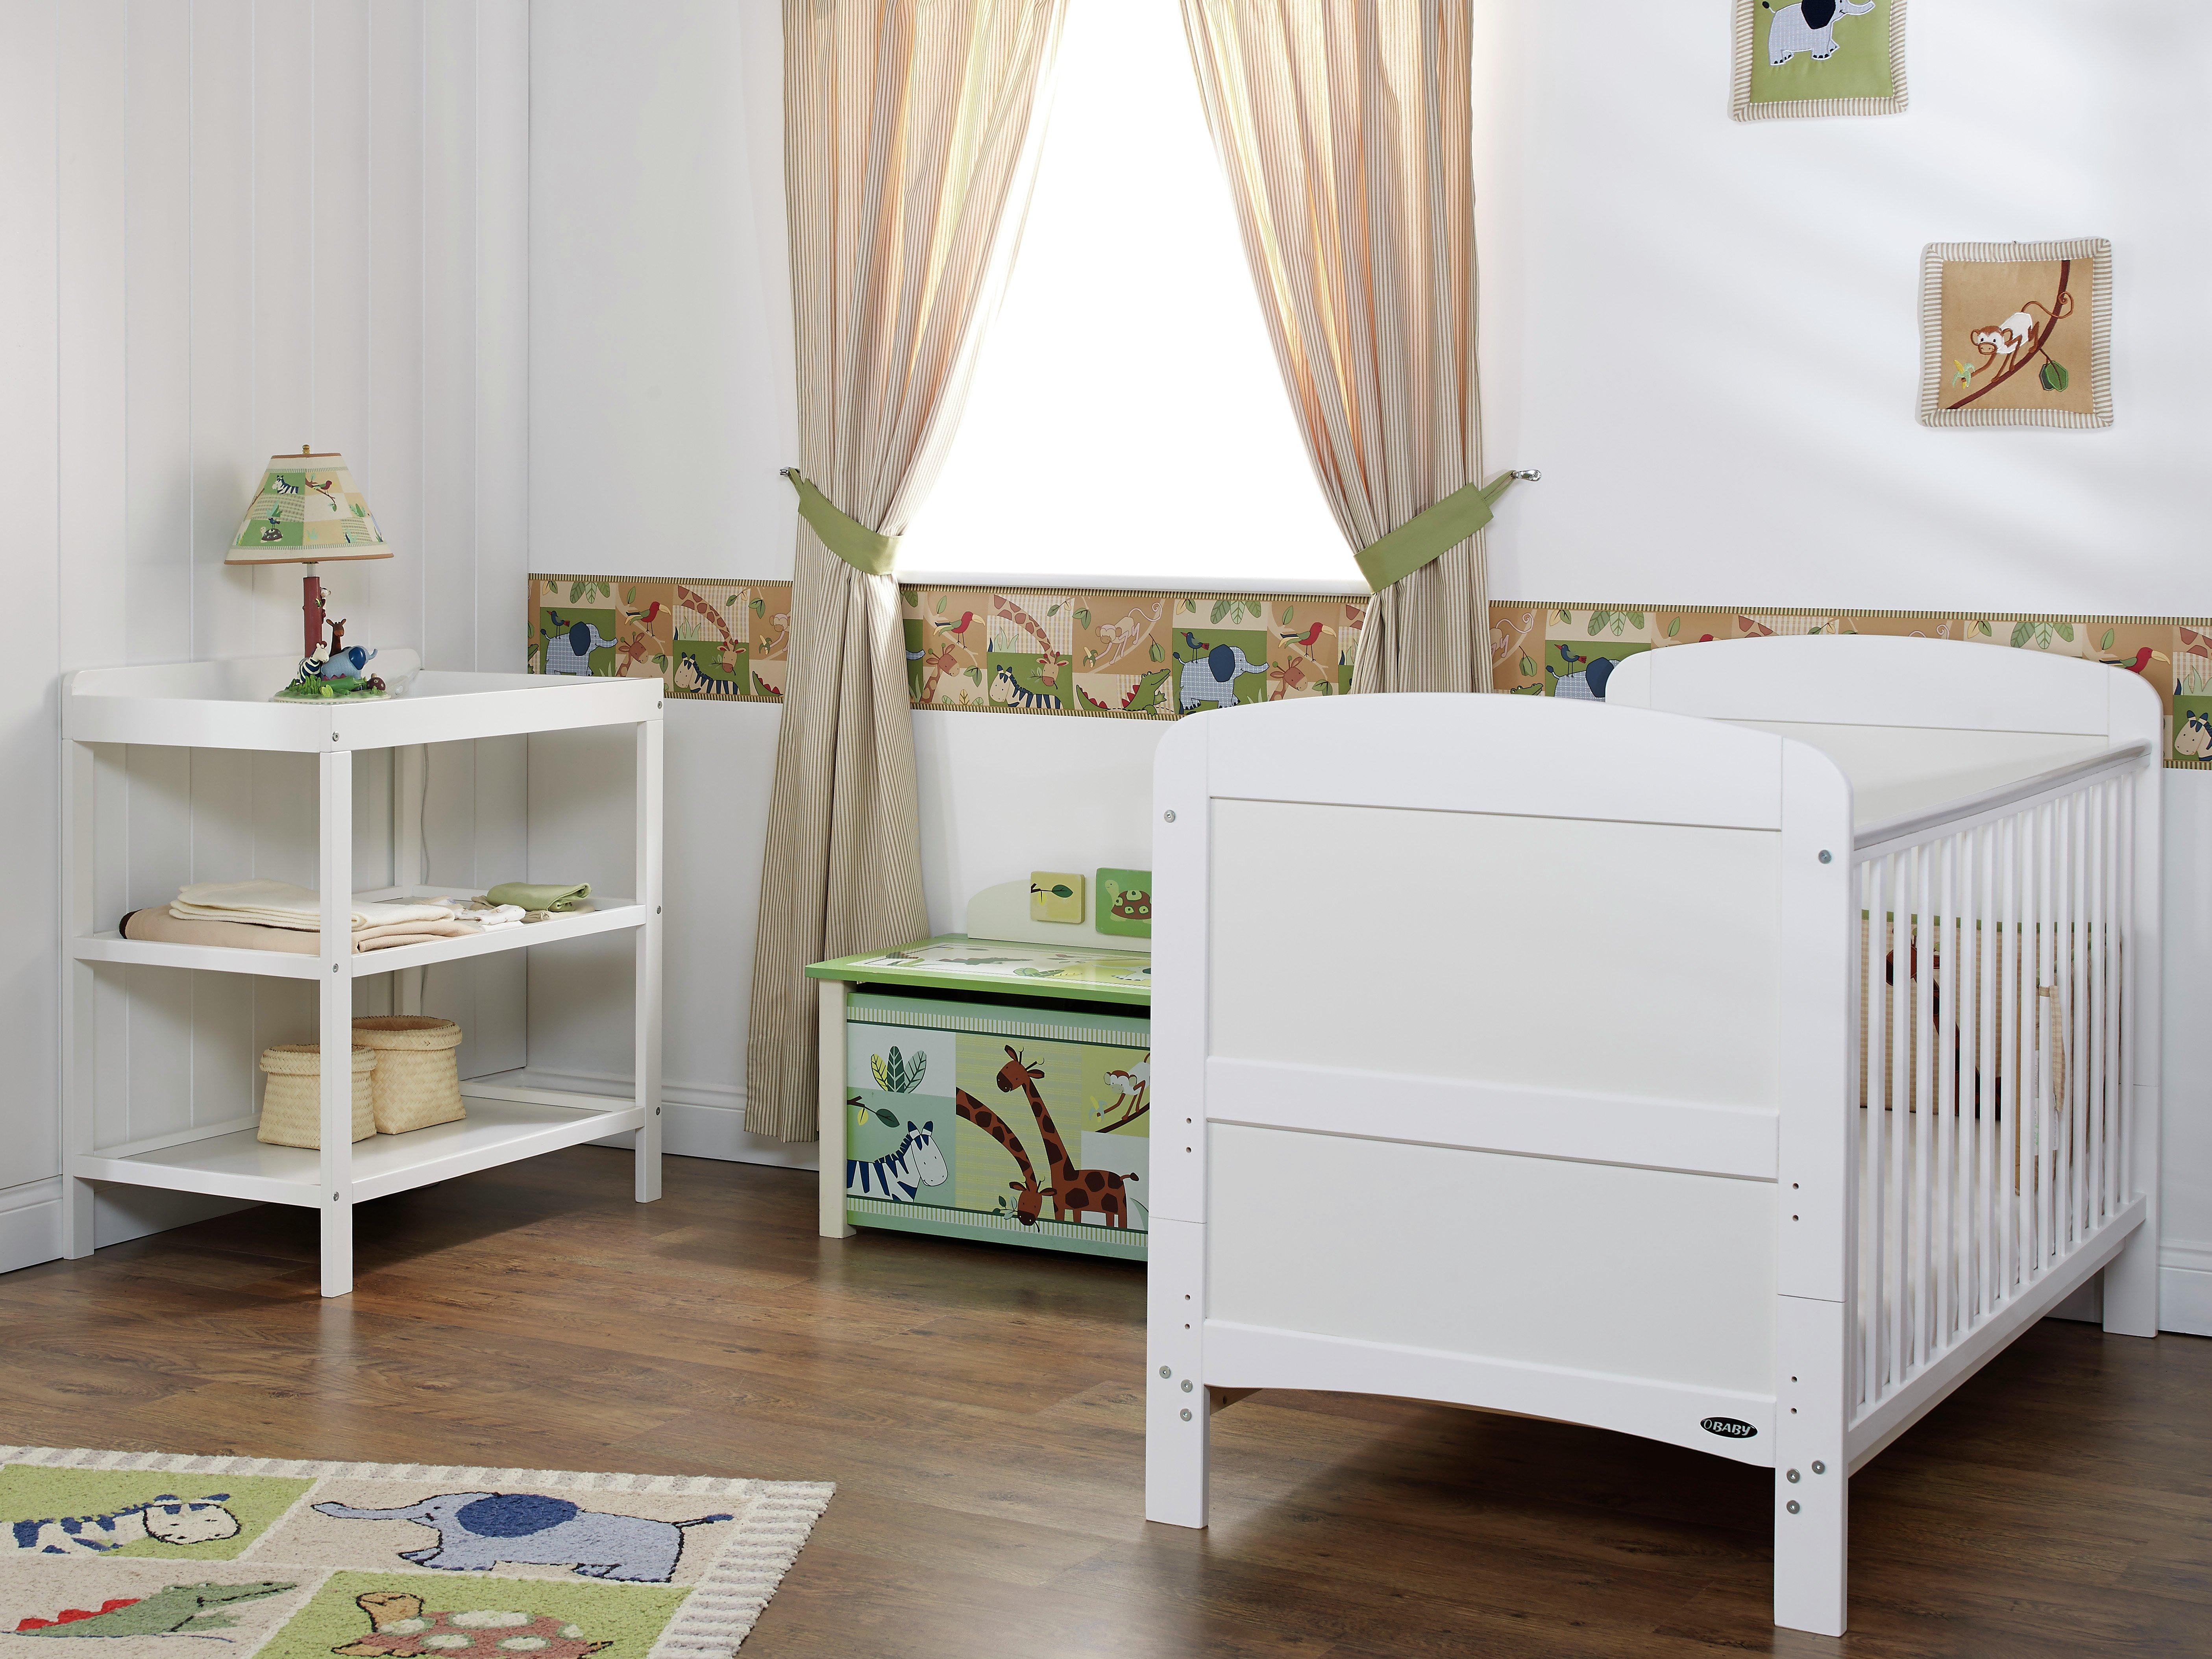 obaby grace 2 piece nursery furniture set  white.